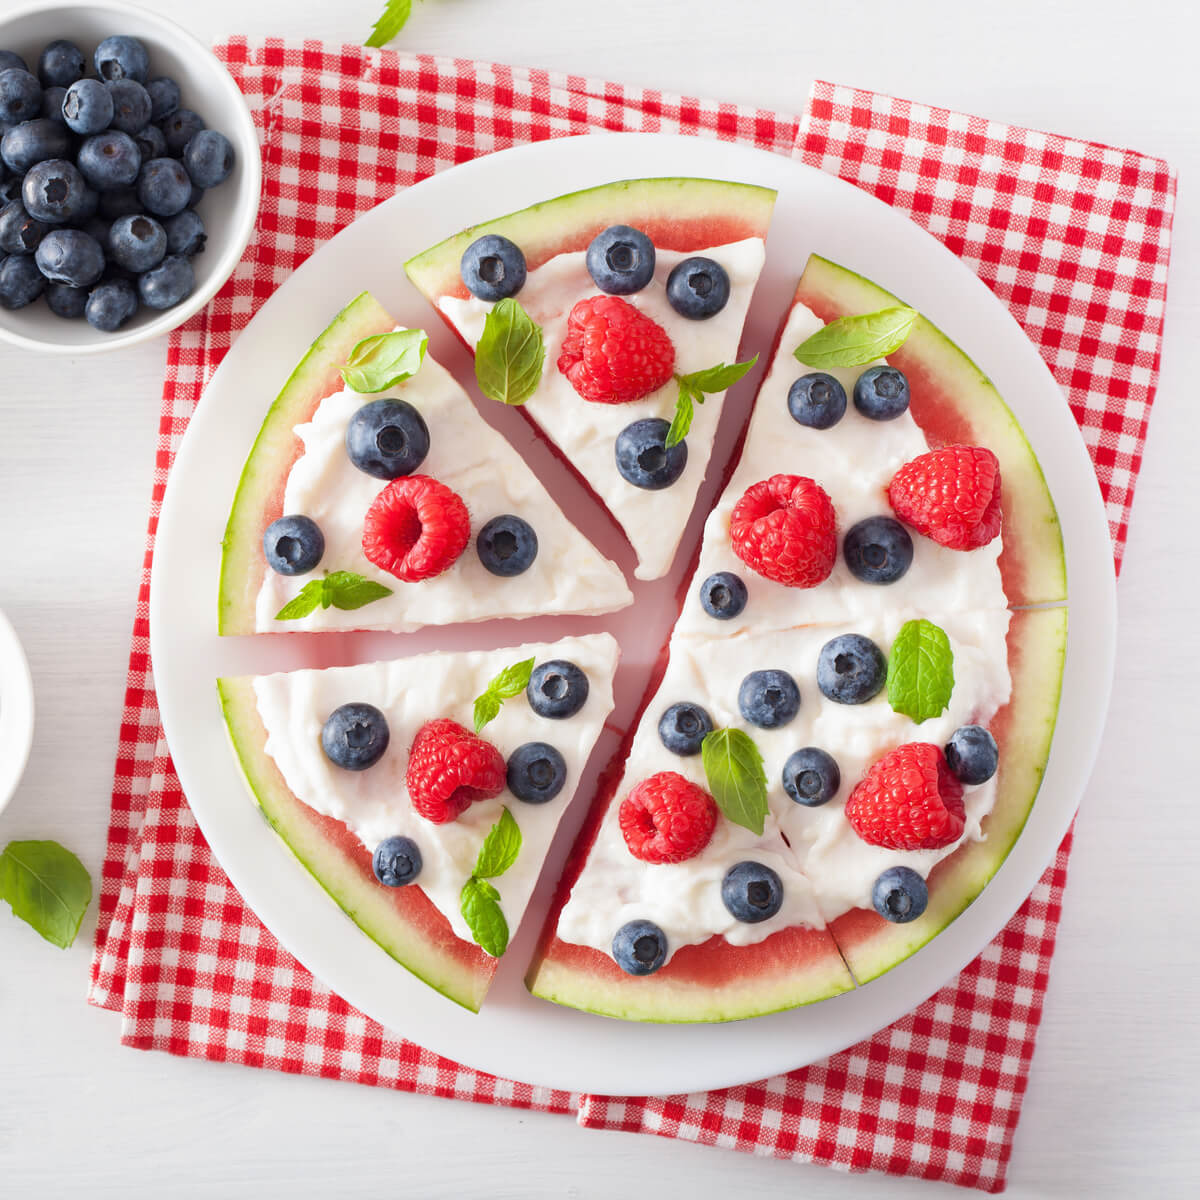 Kalorienarme Wassermelonen Pizza